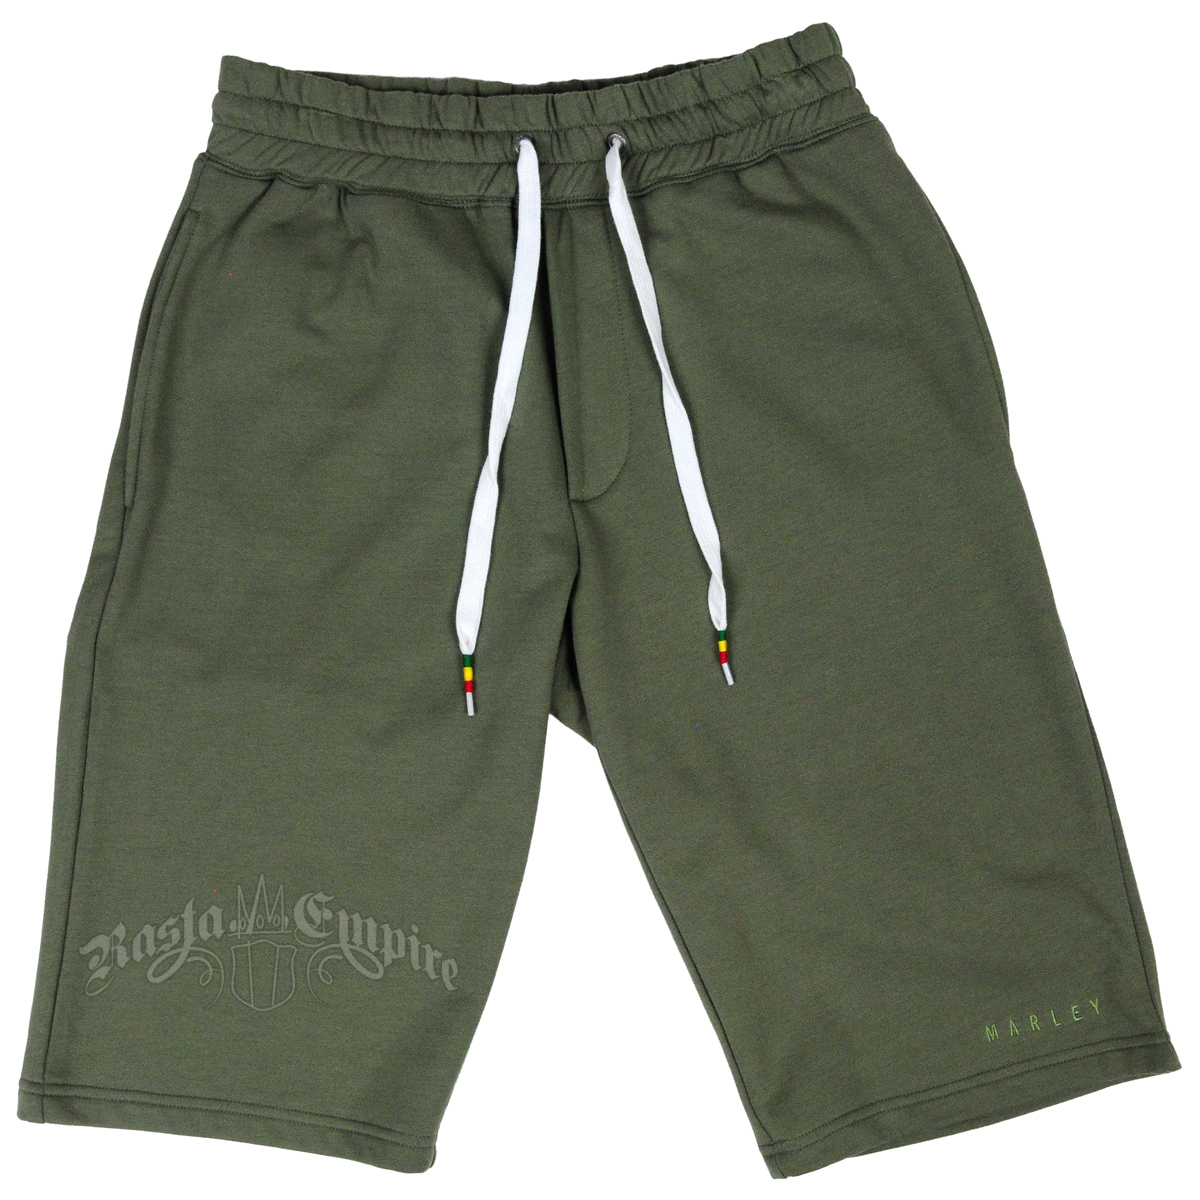 Marley Olive Green Sweat Shorts - Men's at RastaEmpire.com